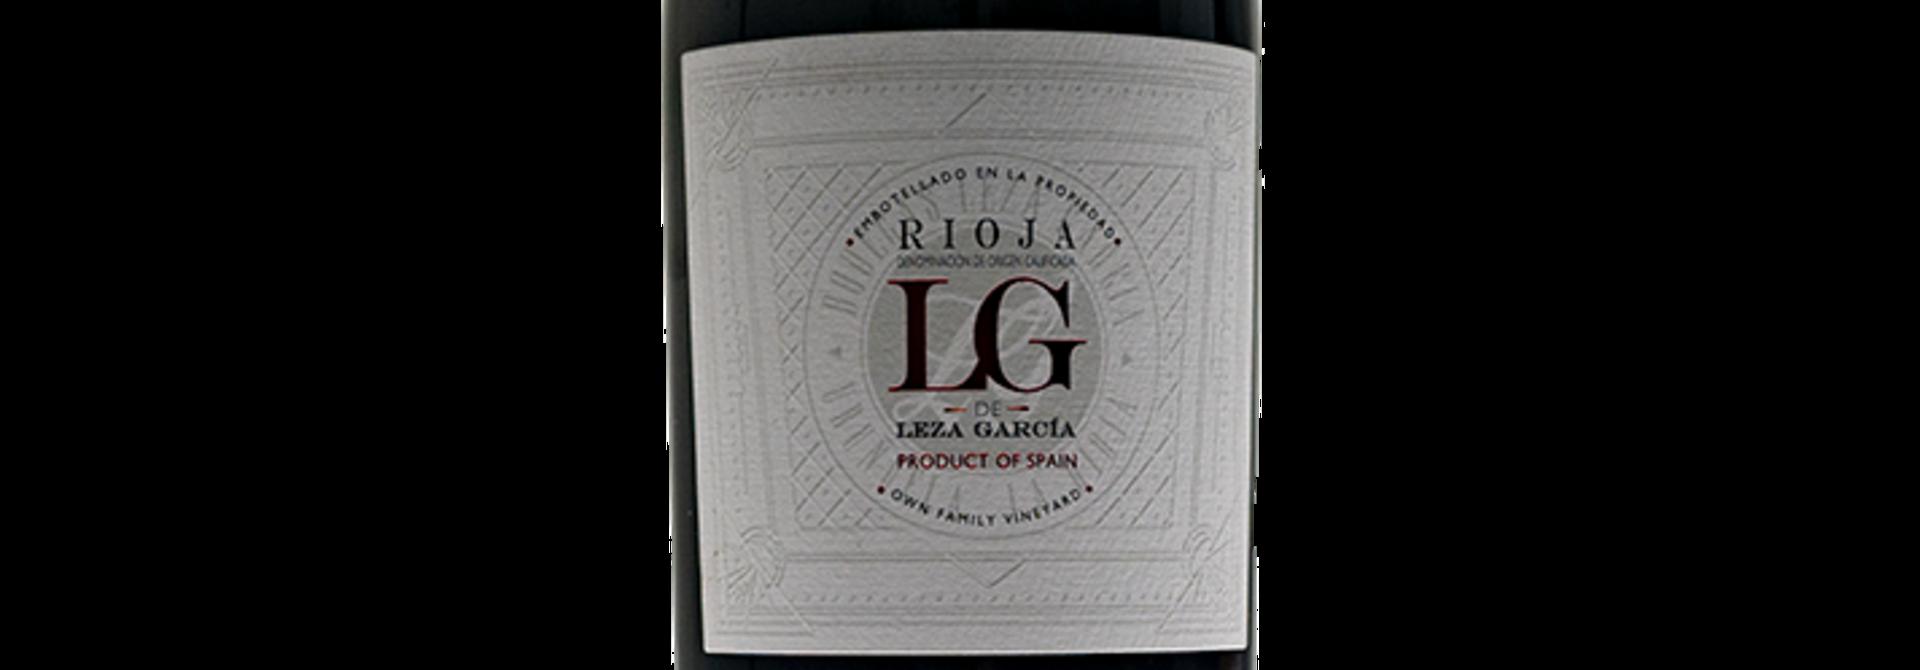 Rioja LG de Leza Garcia 2015